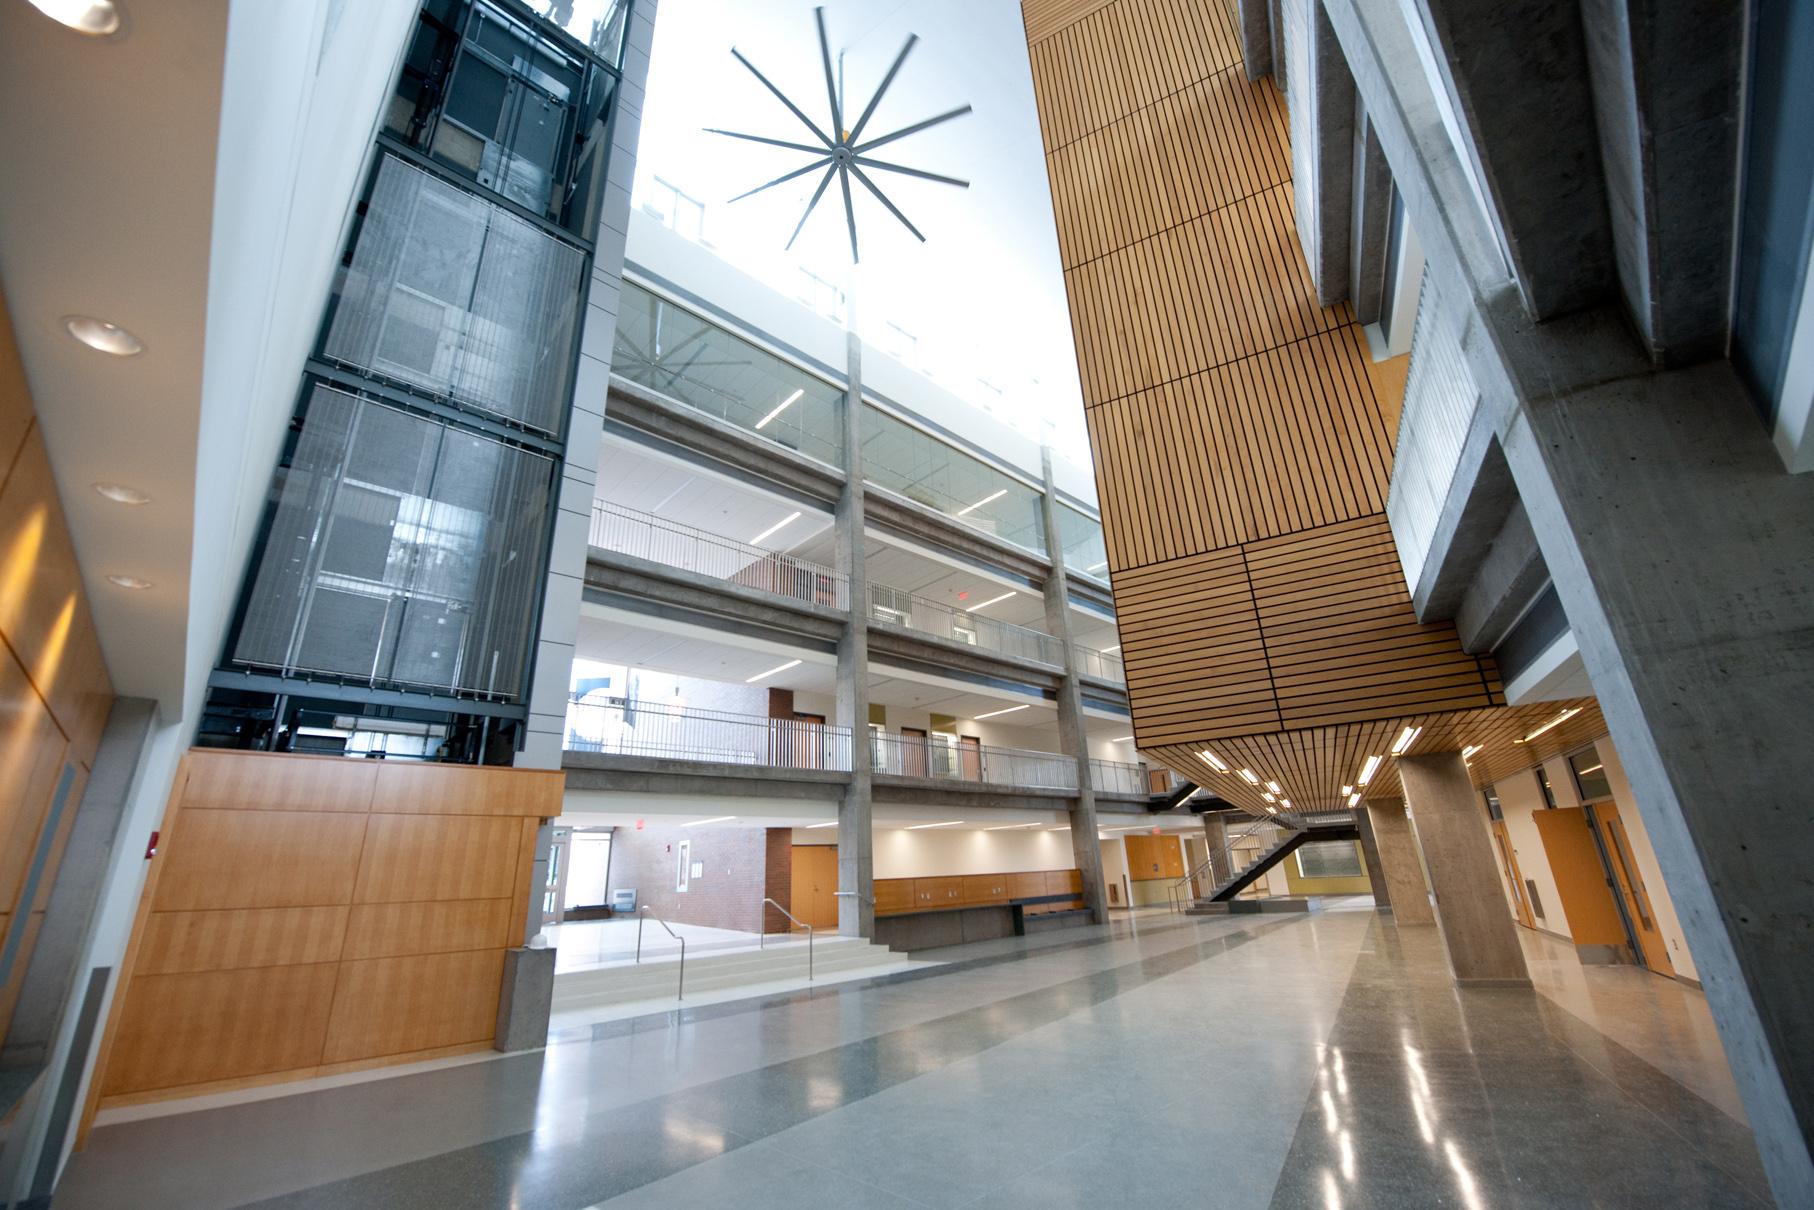 Montgomery College - Science Center